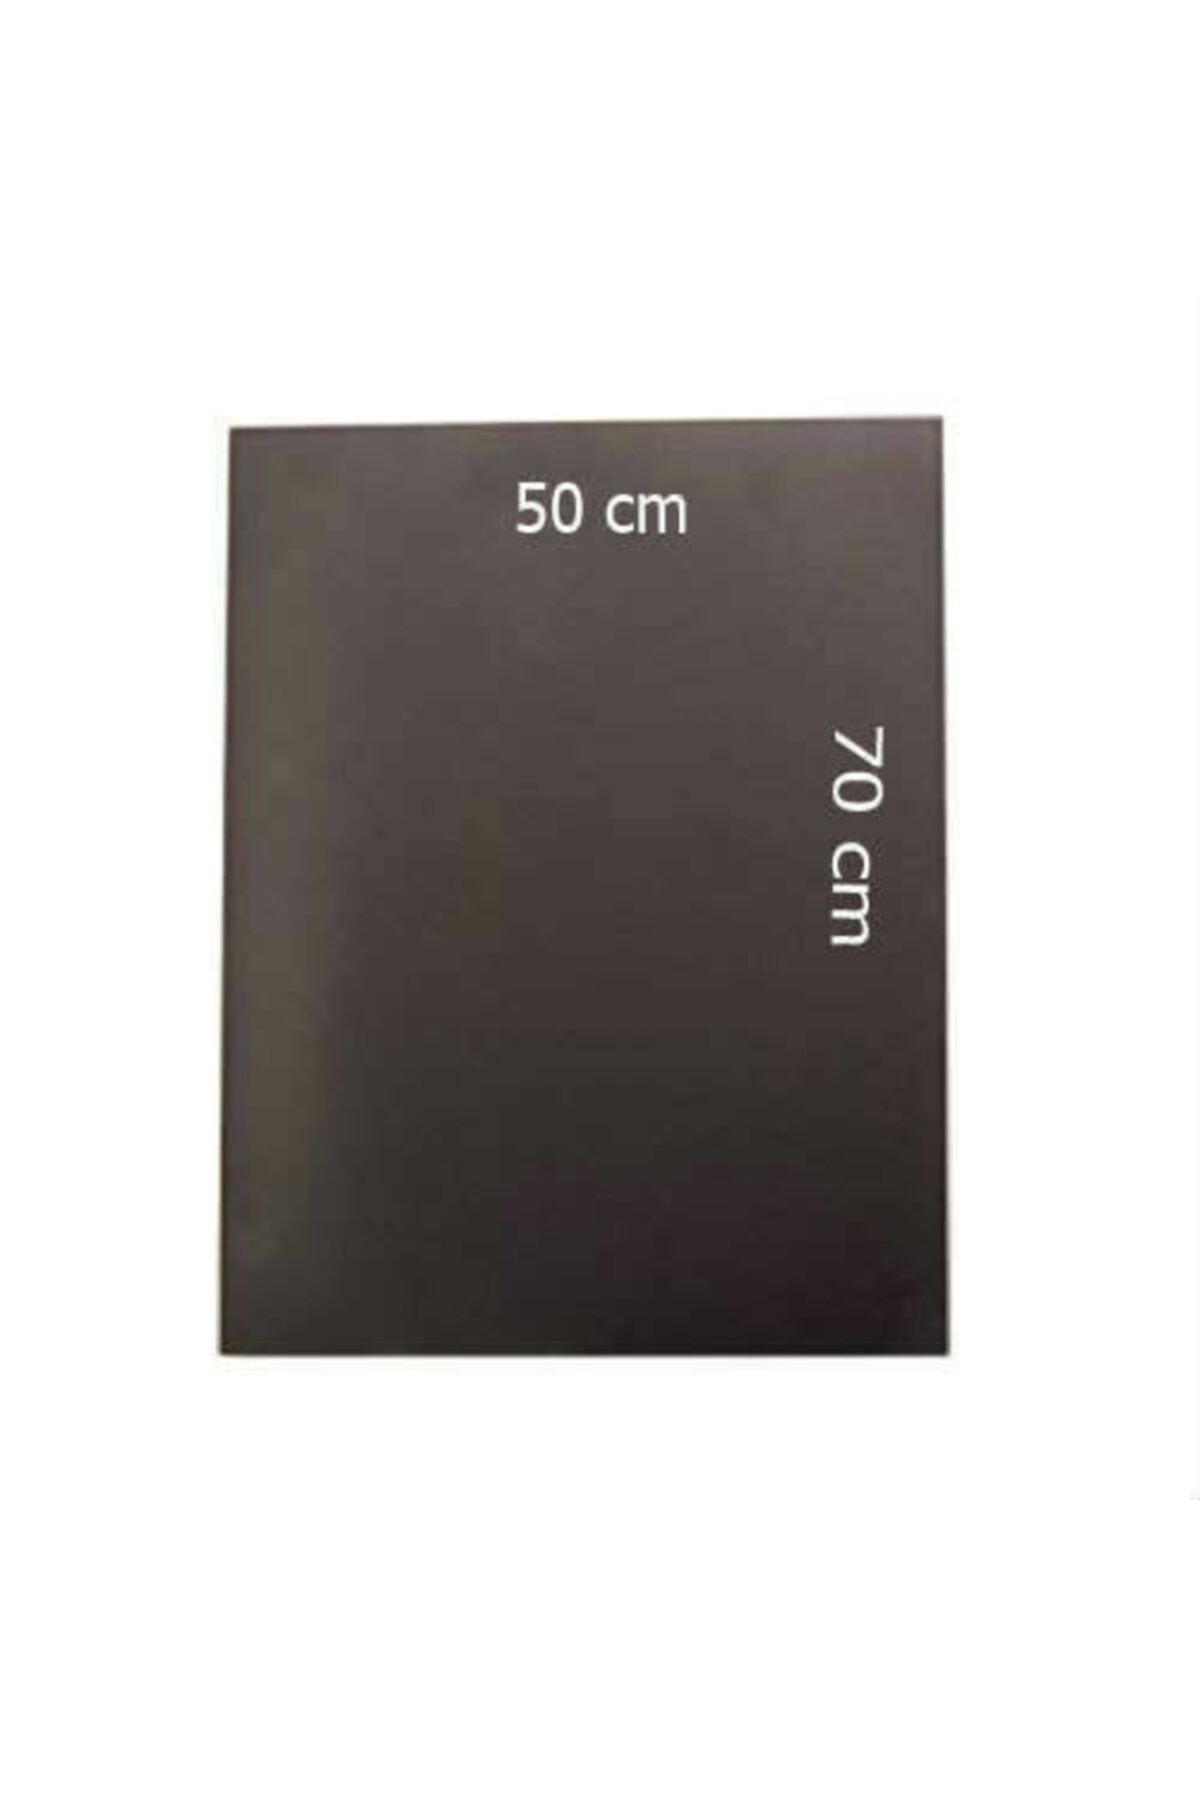 Dünya Magnet Mıknatıs Plaka 70cmx50cm - Fotoğraf Magneti - Tabaka Levha Magnet 2